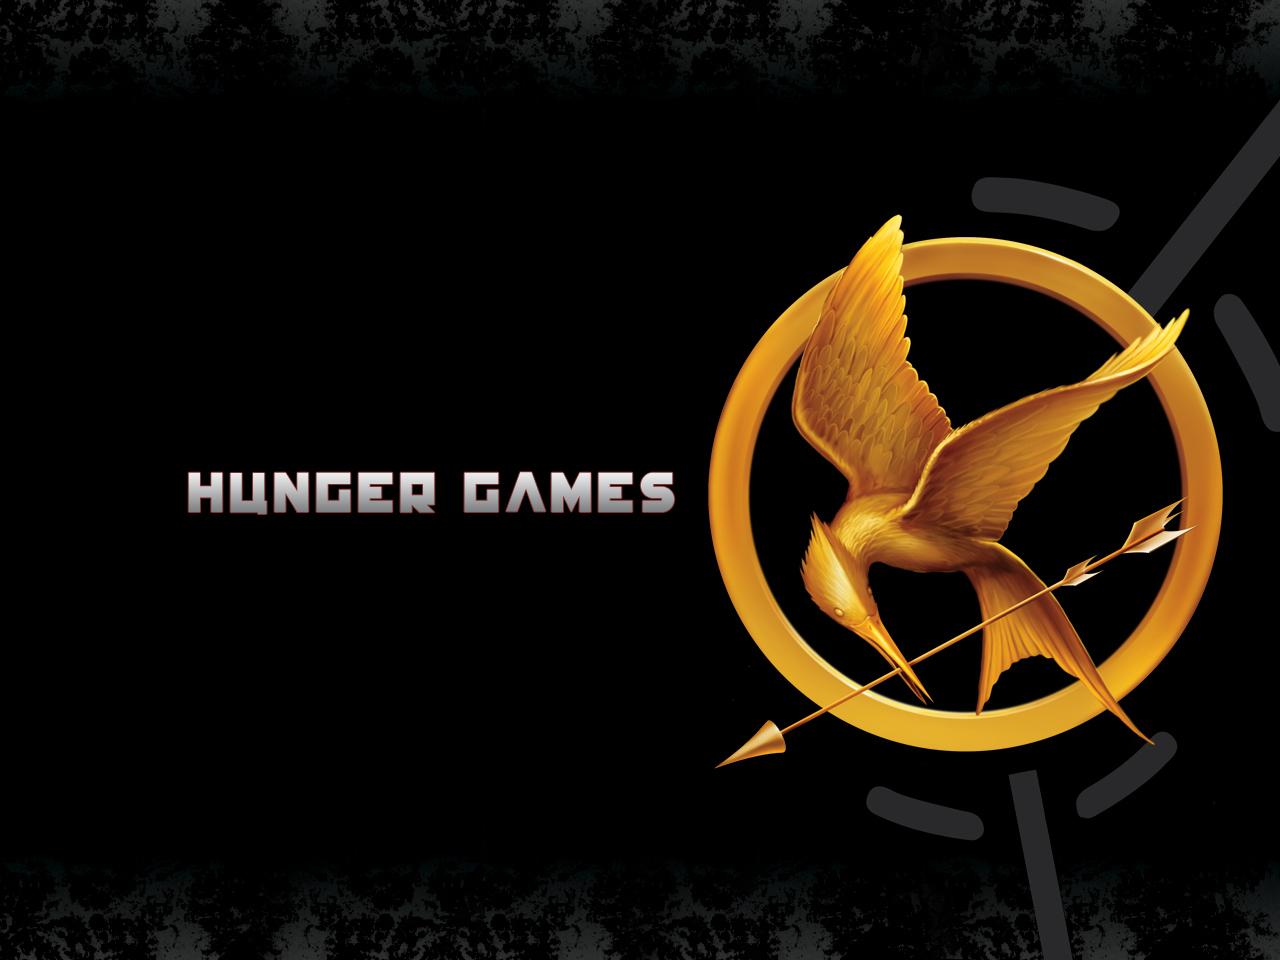 Hunger Games Wallpaper